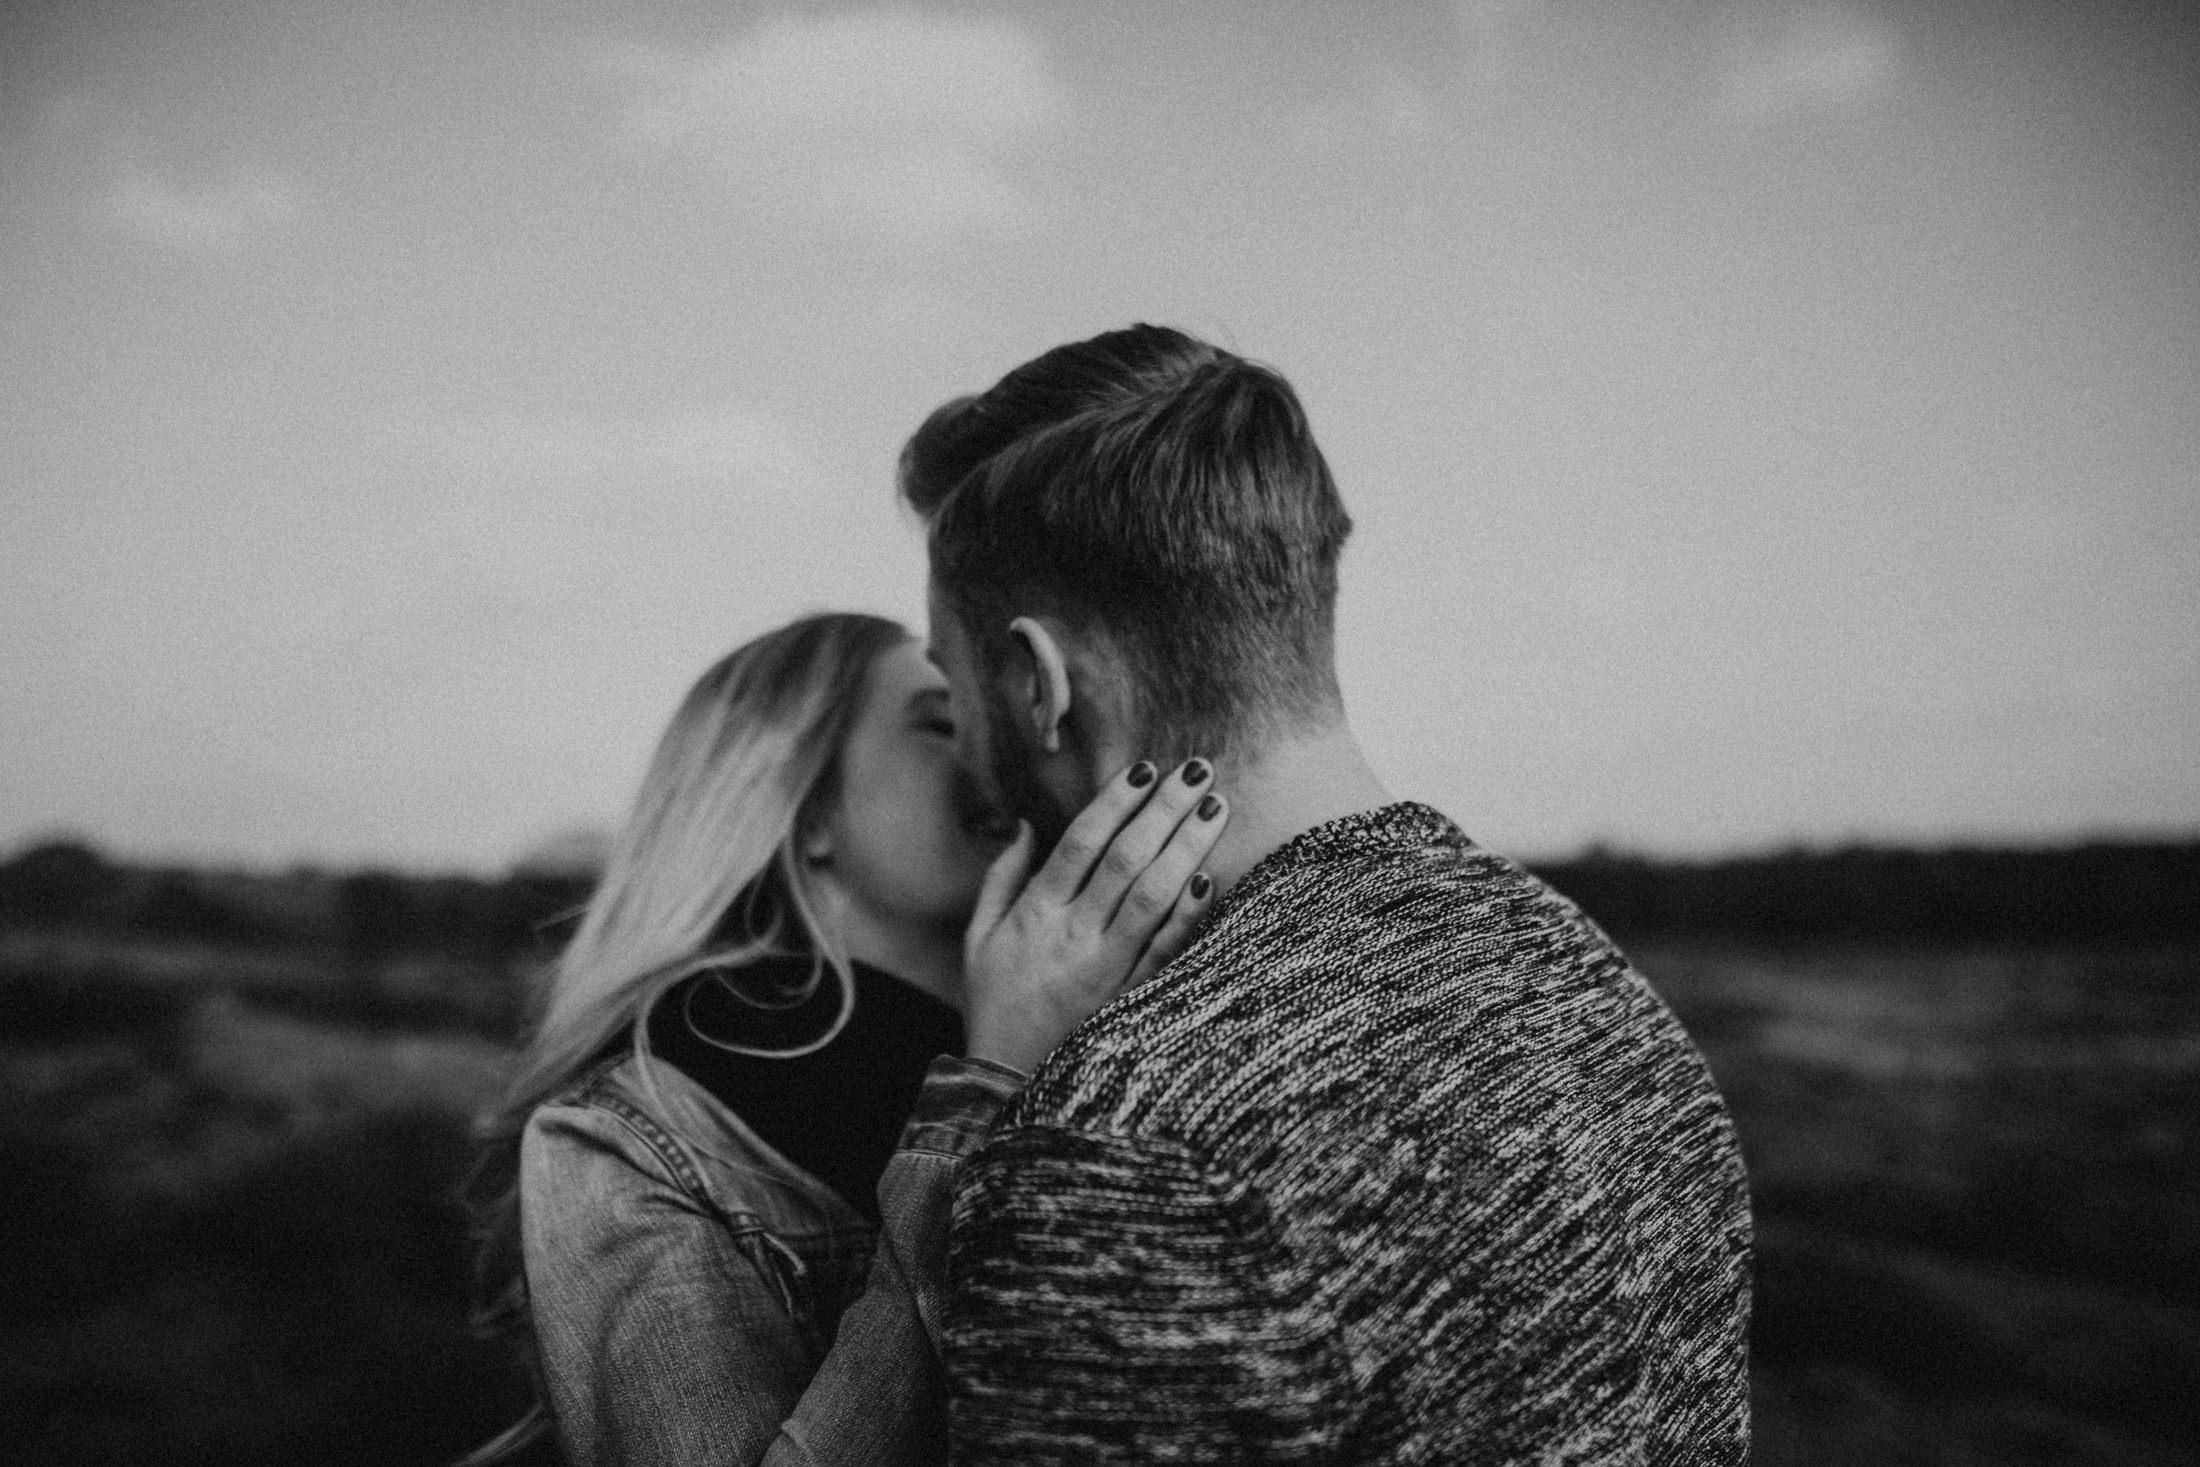 Wedding_Photographer_Mallorca_Daniela-Marquardt_Photography_CanaryIslands_Lanzarote_Iceland_Tuskany_Santorini_Portugal__Austria_Elopement_Hochzeitsfotograf_Milena_Marvin_6